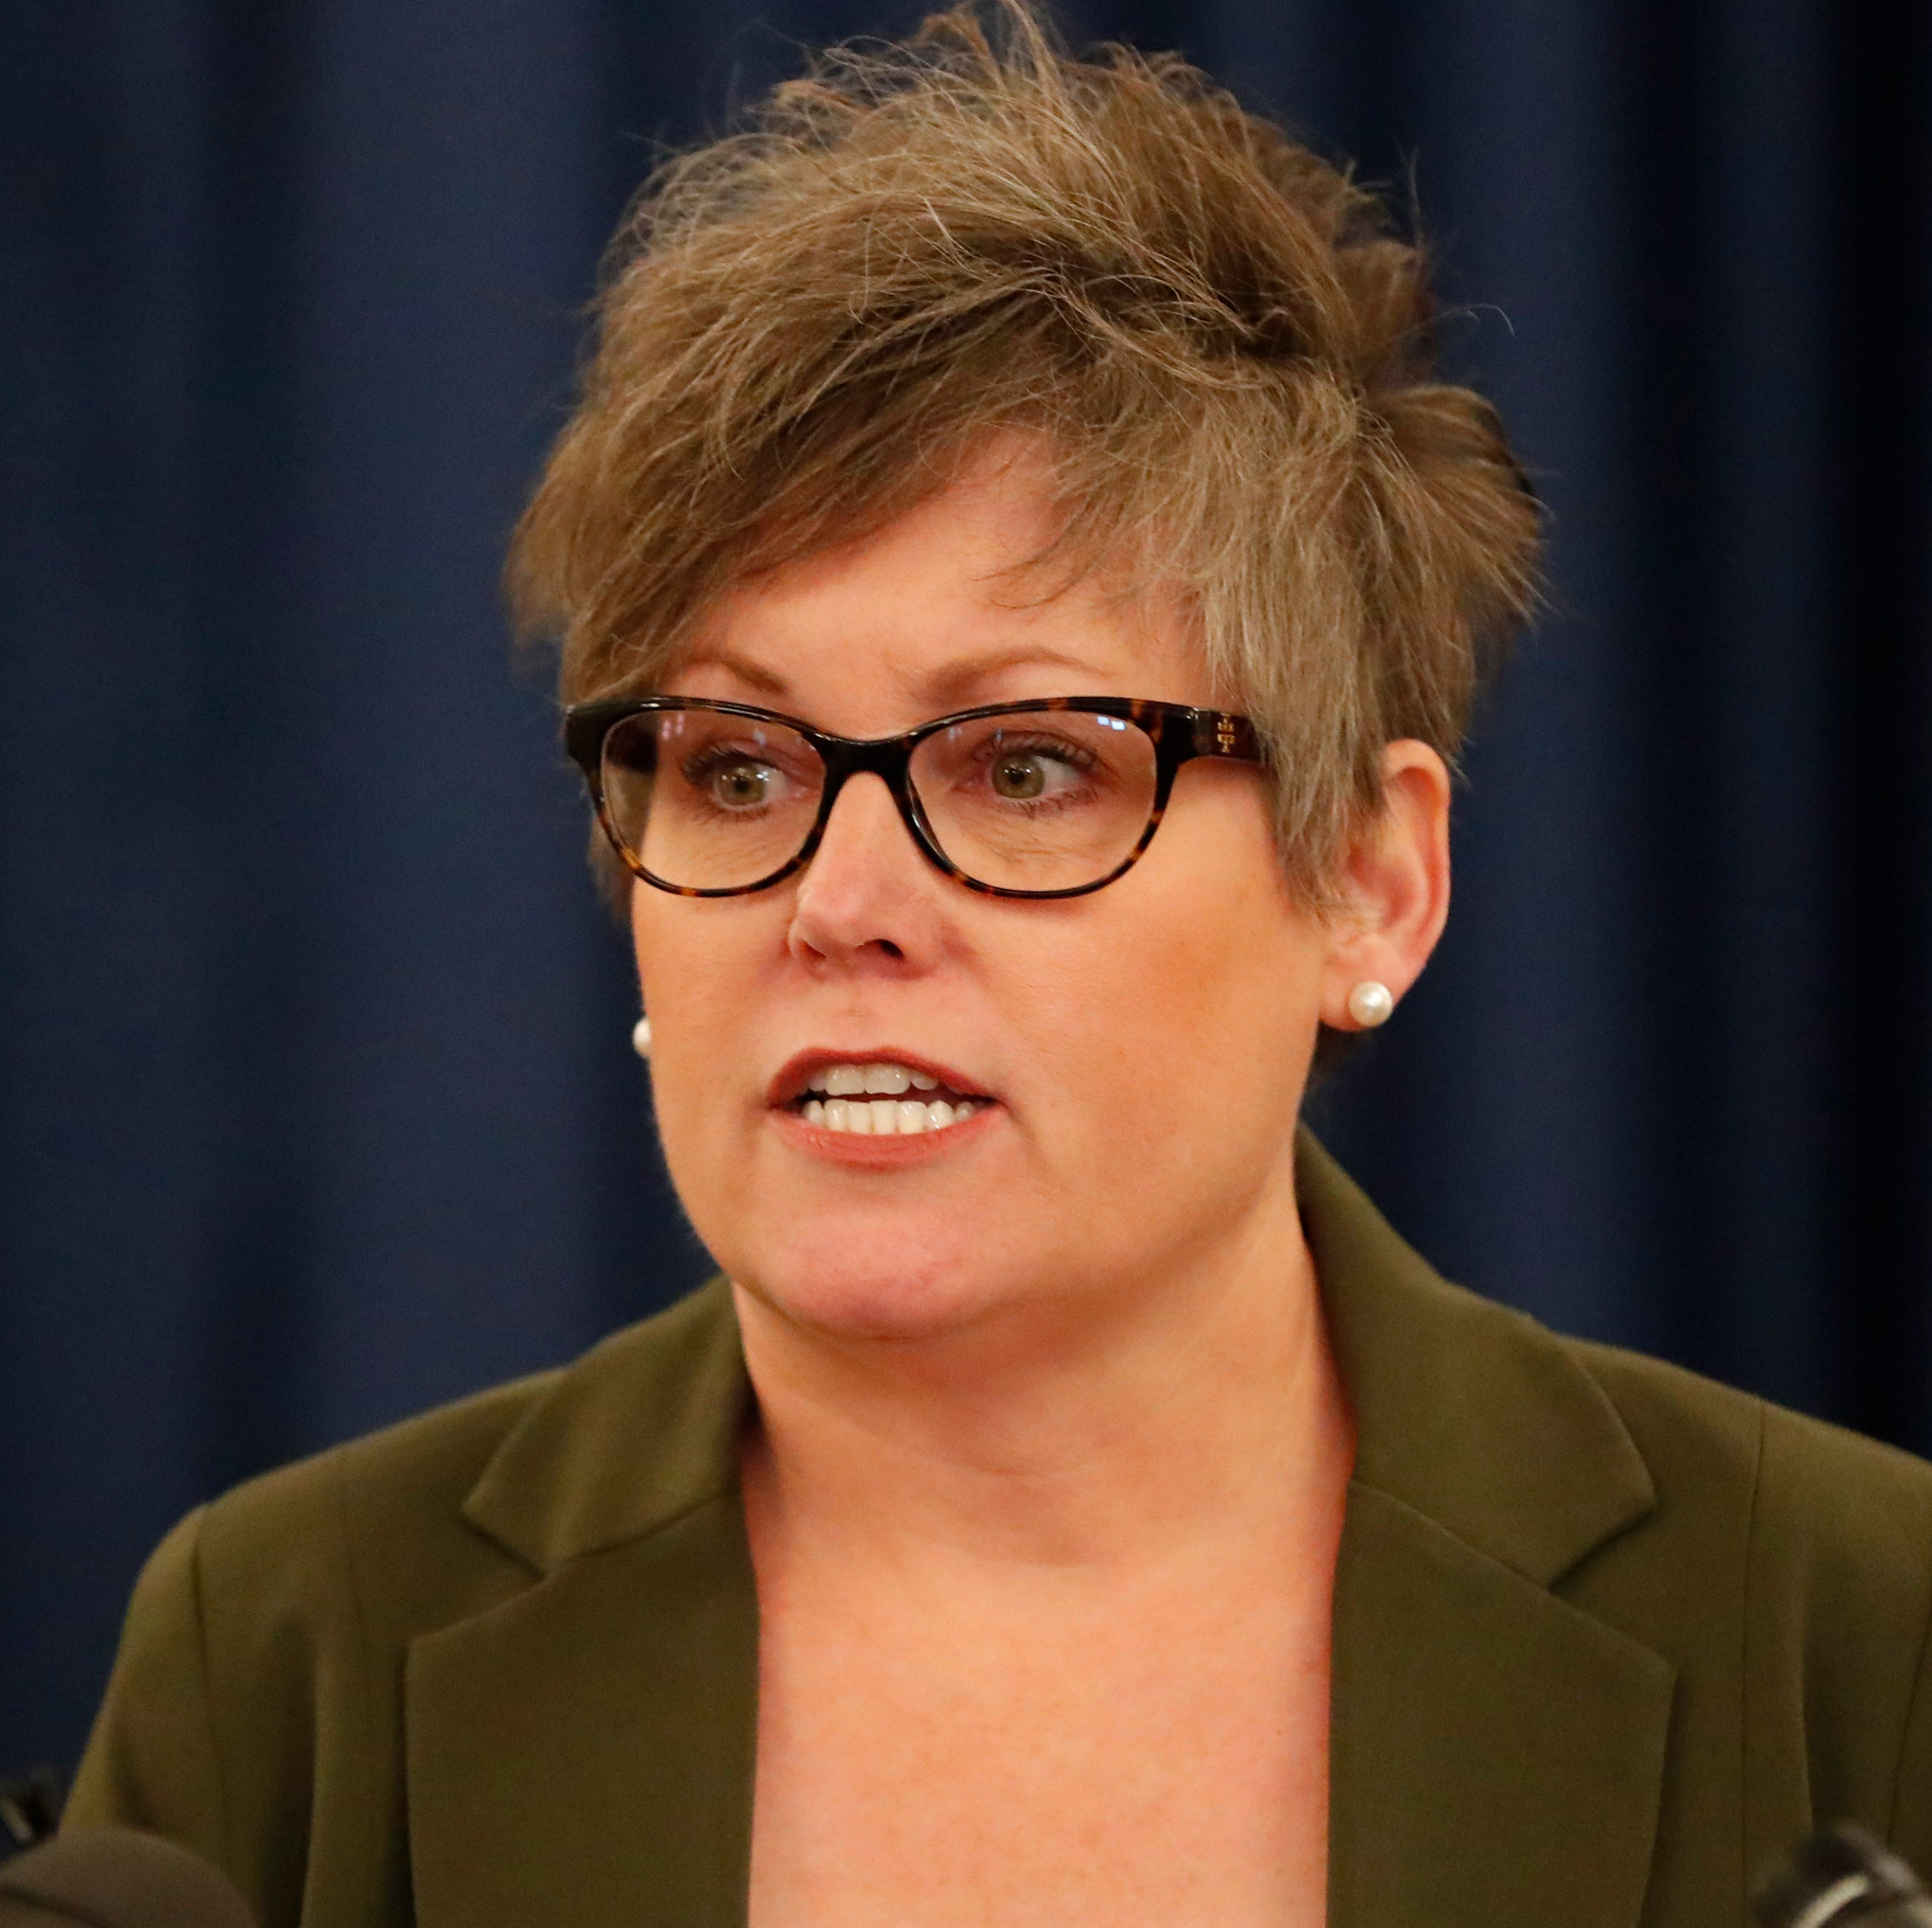 Behind Katie Hobbs' win: How Democrats flipped Arizona's 2nd-highest office